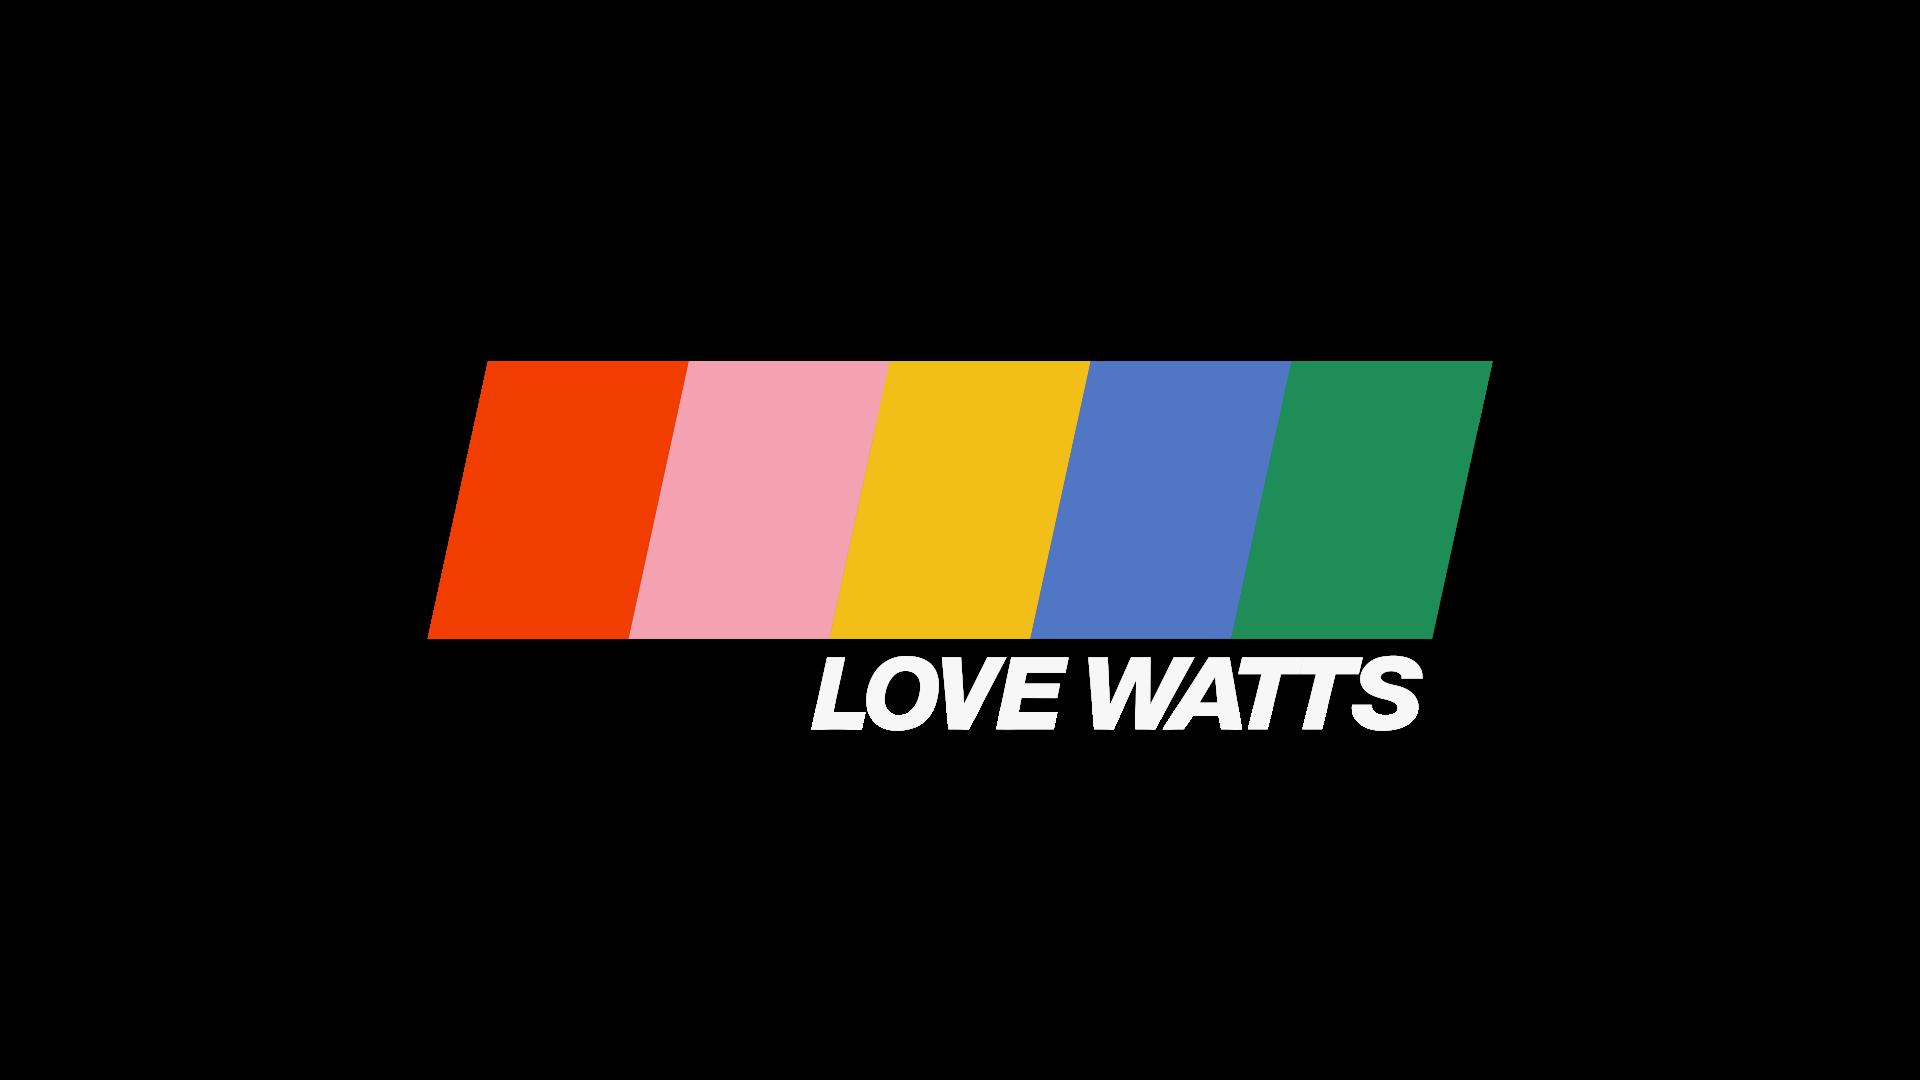 LOVEWATTS LOGO STANDARDS 7-70-2019 (2).png